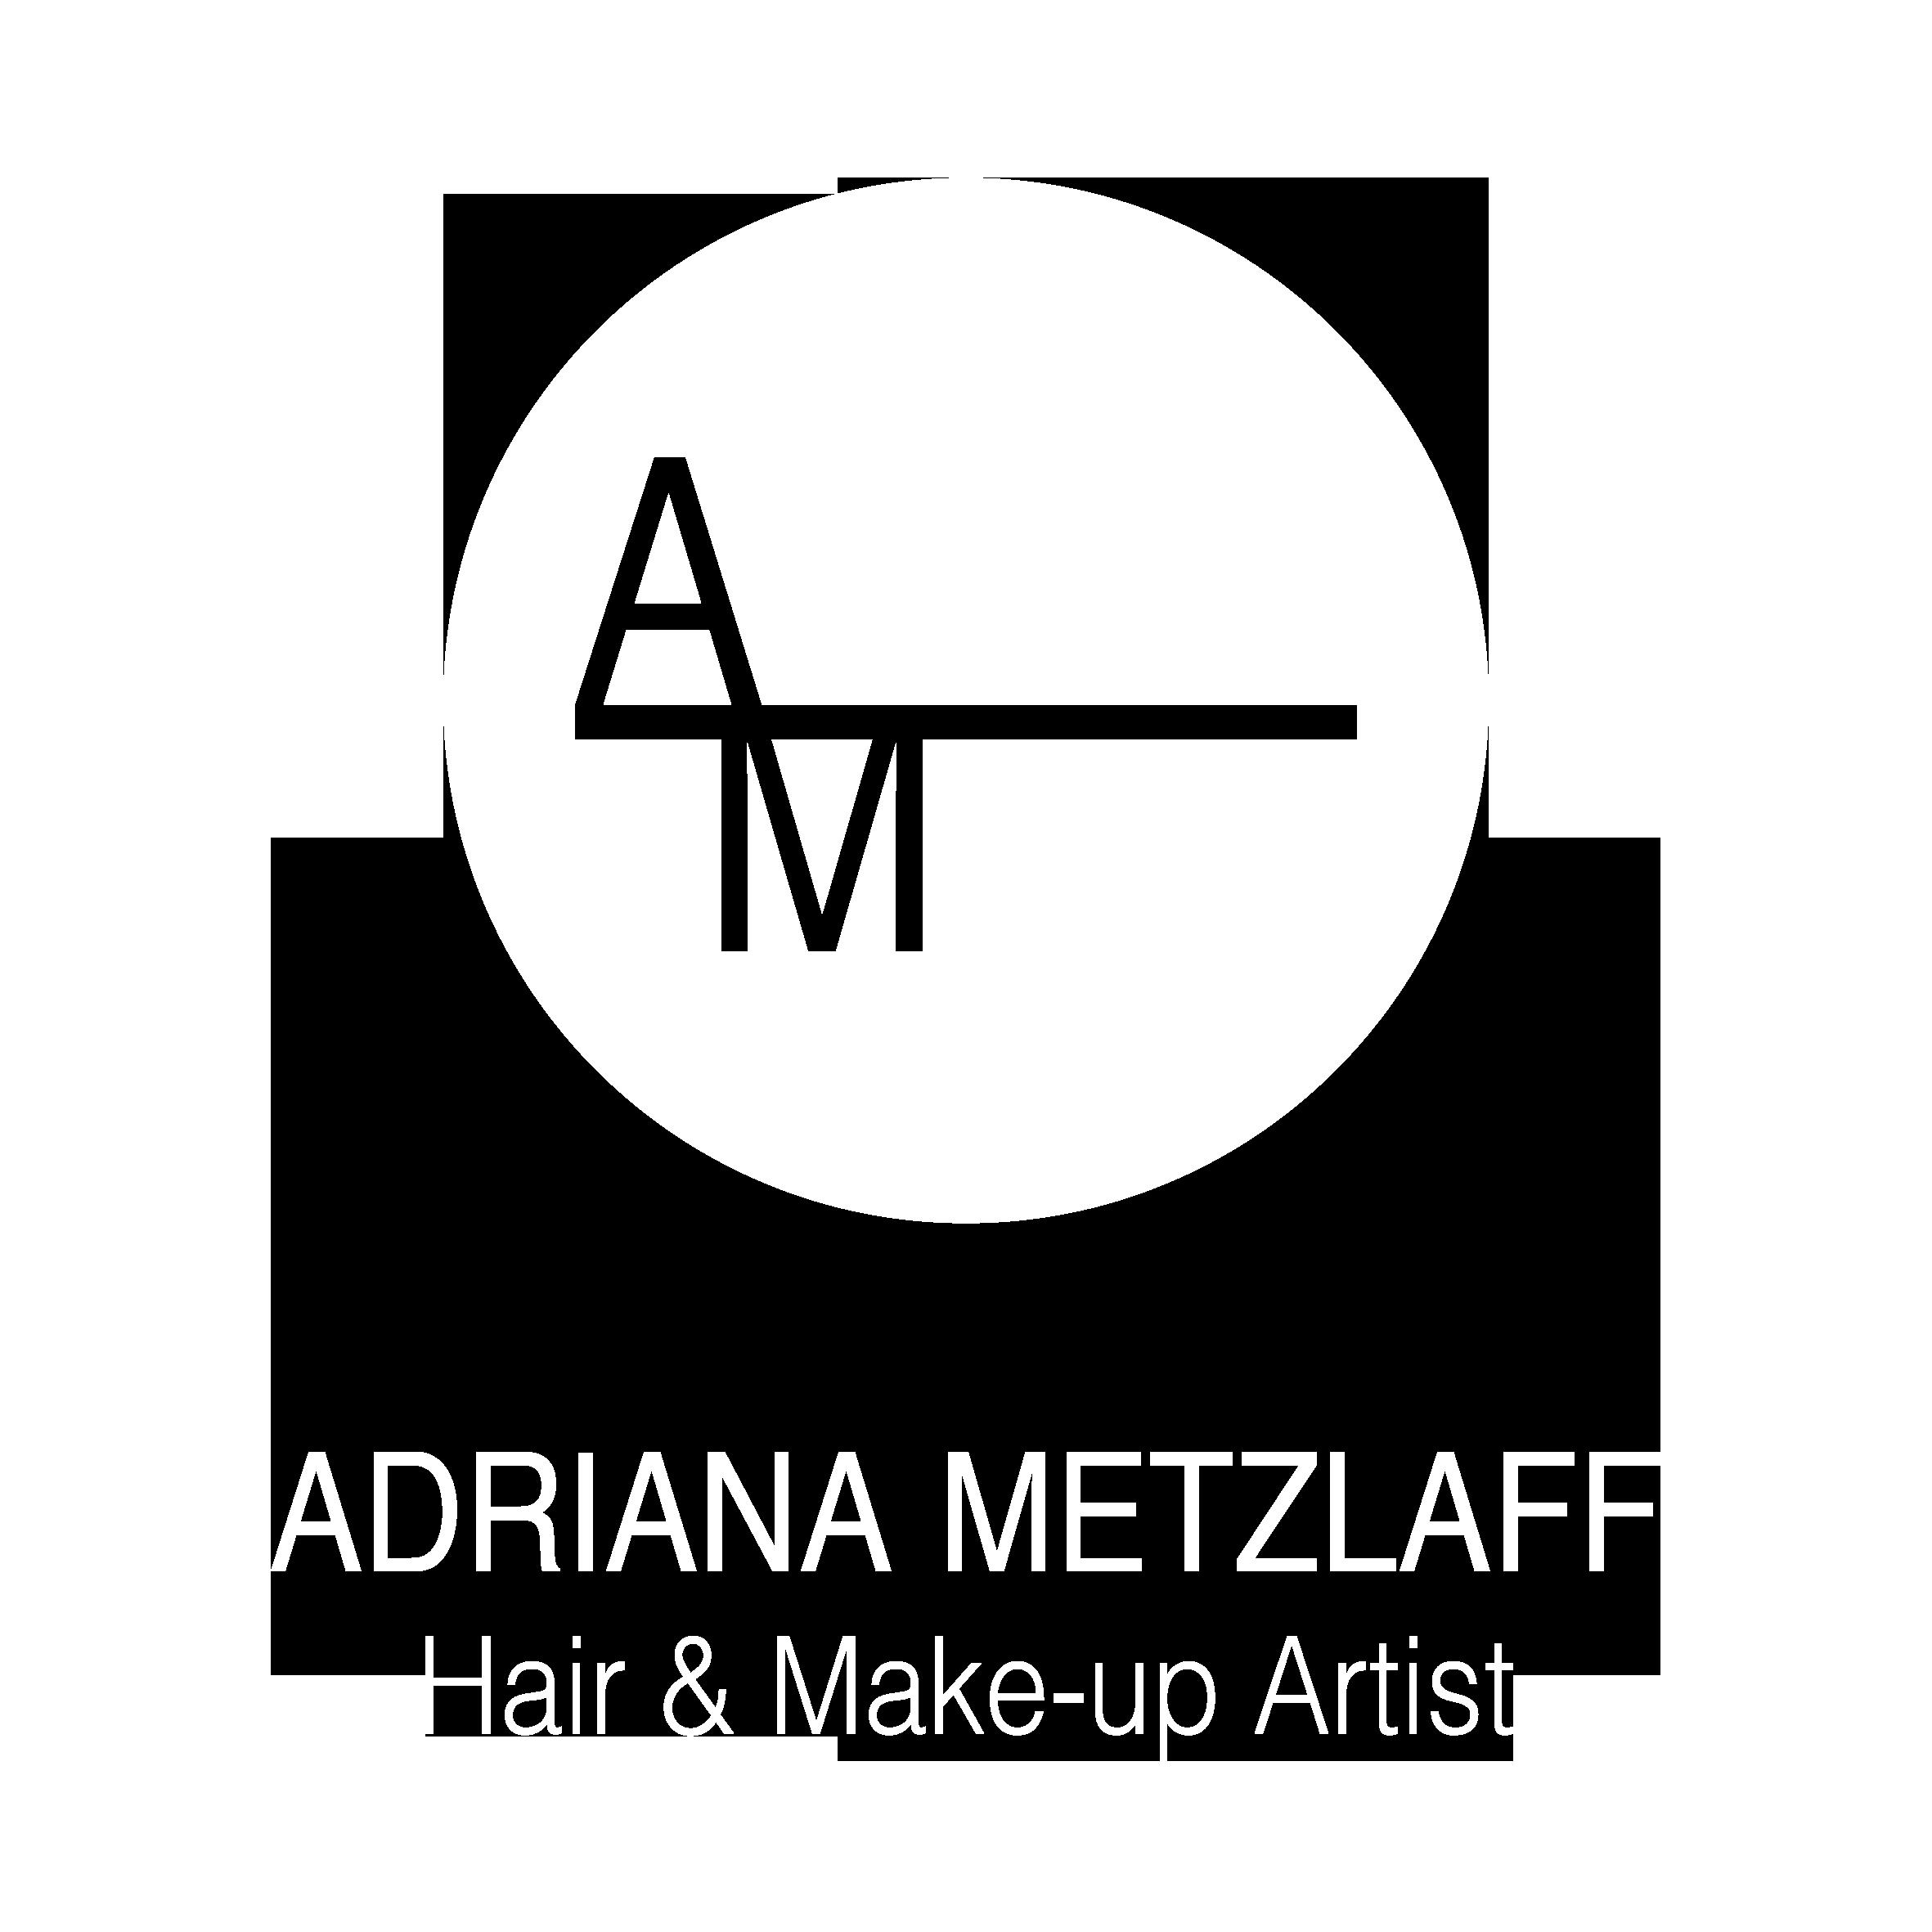 Adriana Metzlaff